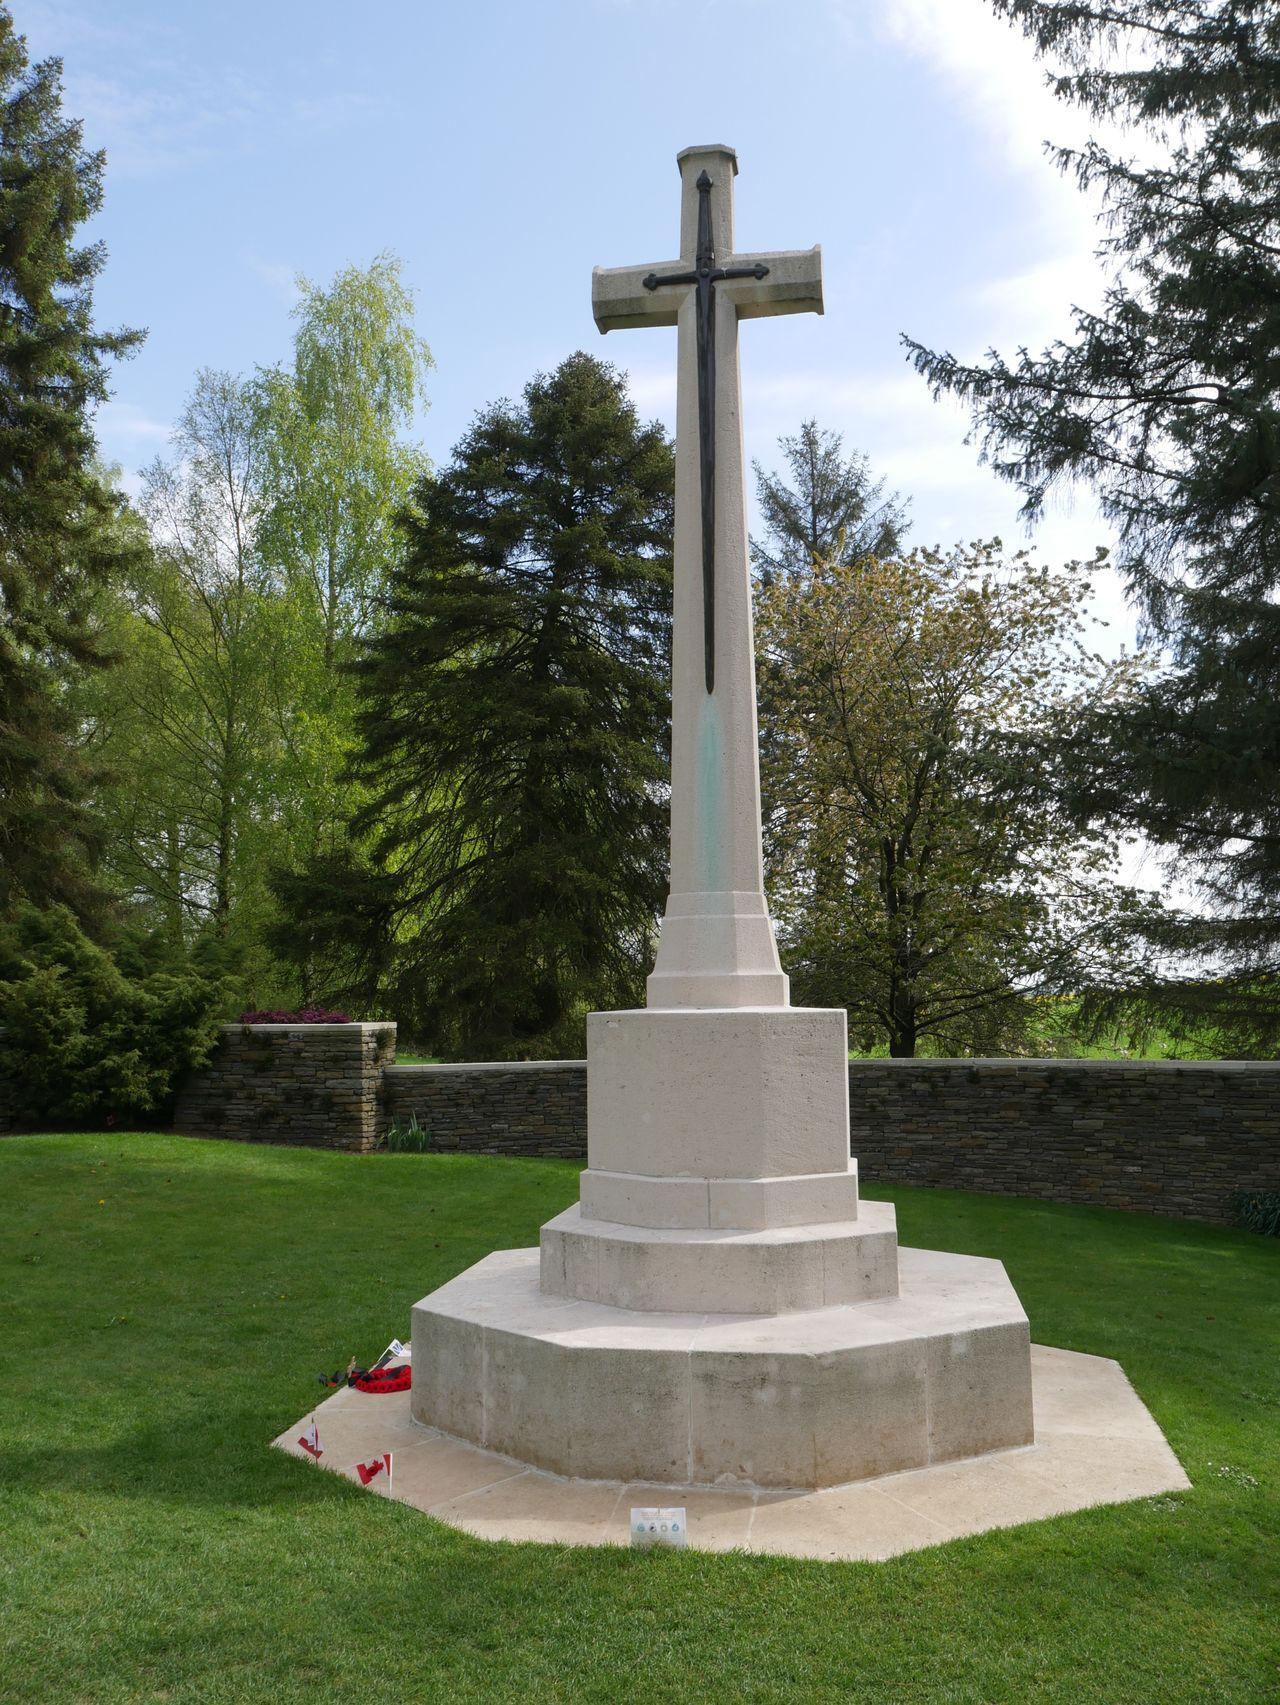 Cross Cross Memorial Cemetery Beaumont- Hamel Memorial Newfoundland War Memorial Somme Cemetery France Picardy Ww1 War Memorial